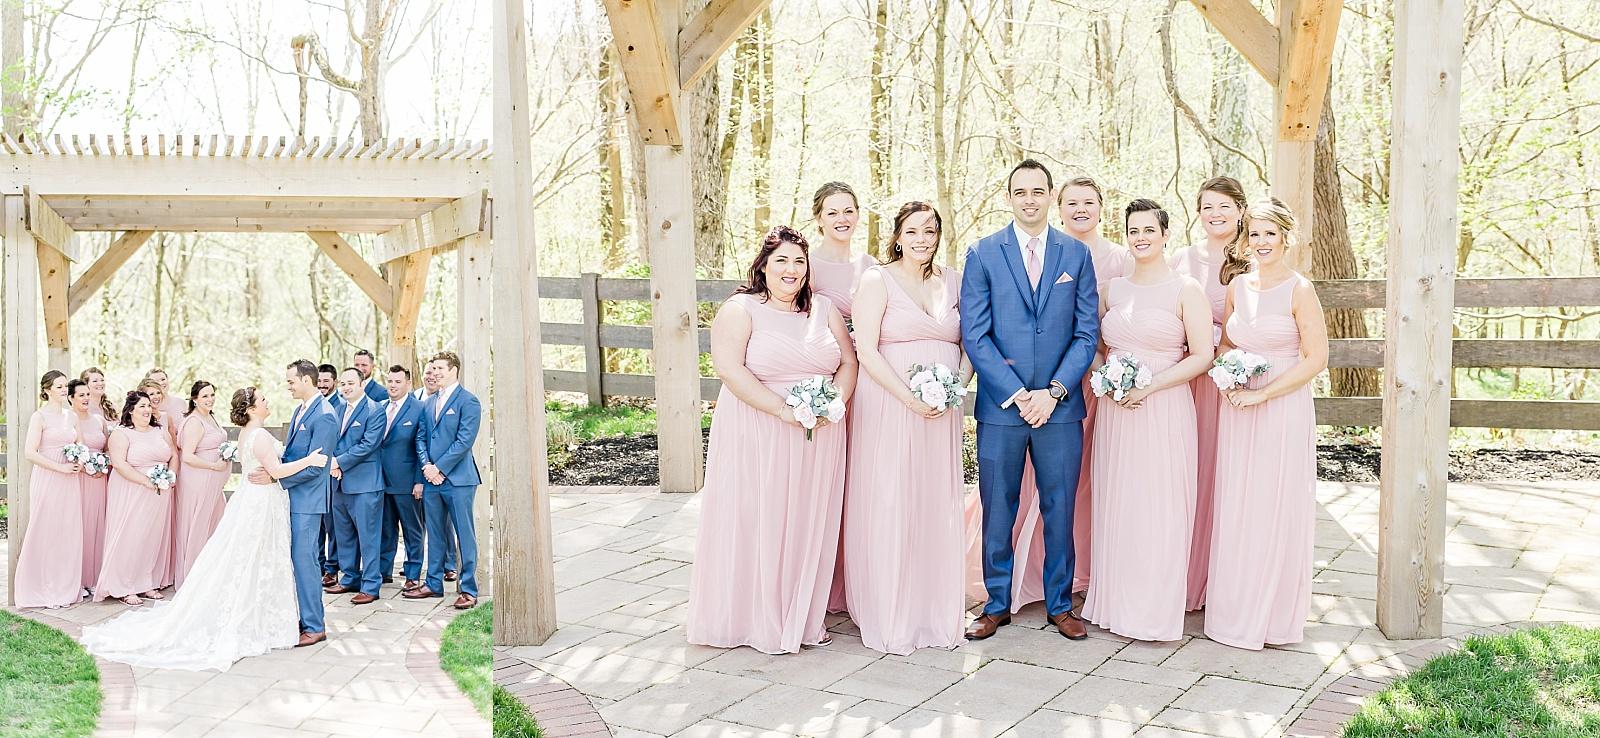 crawfordsville indiana stone creek lodge wedding rustic elegant friends theme_0129.jpg